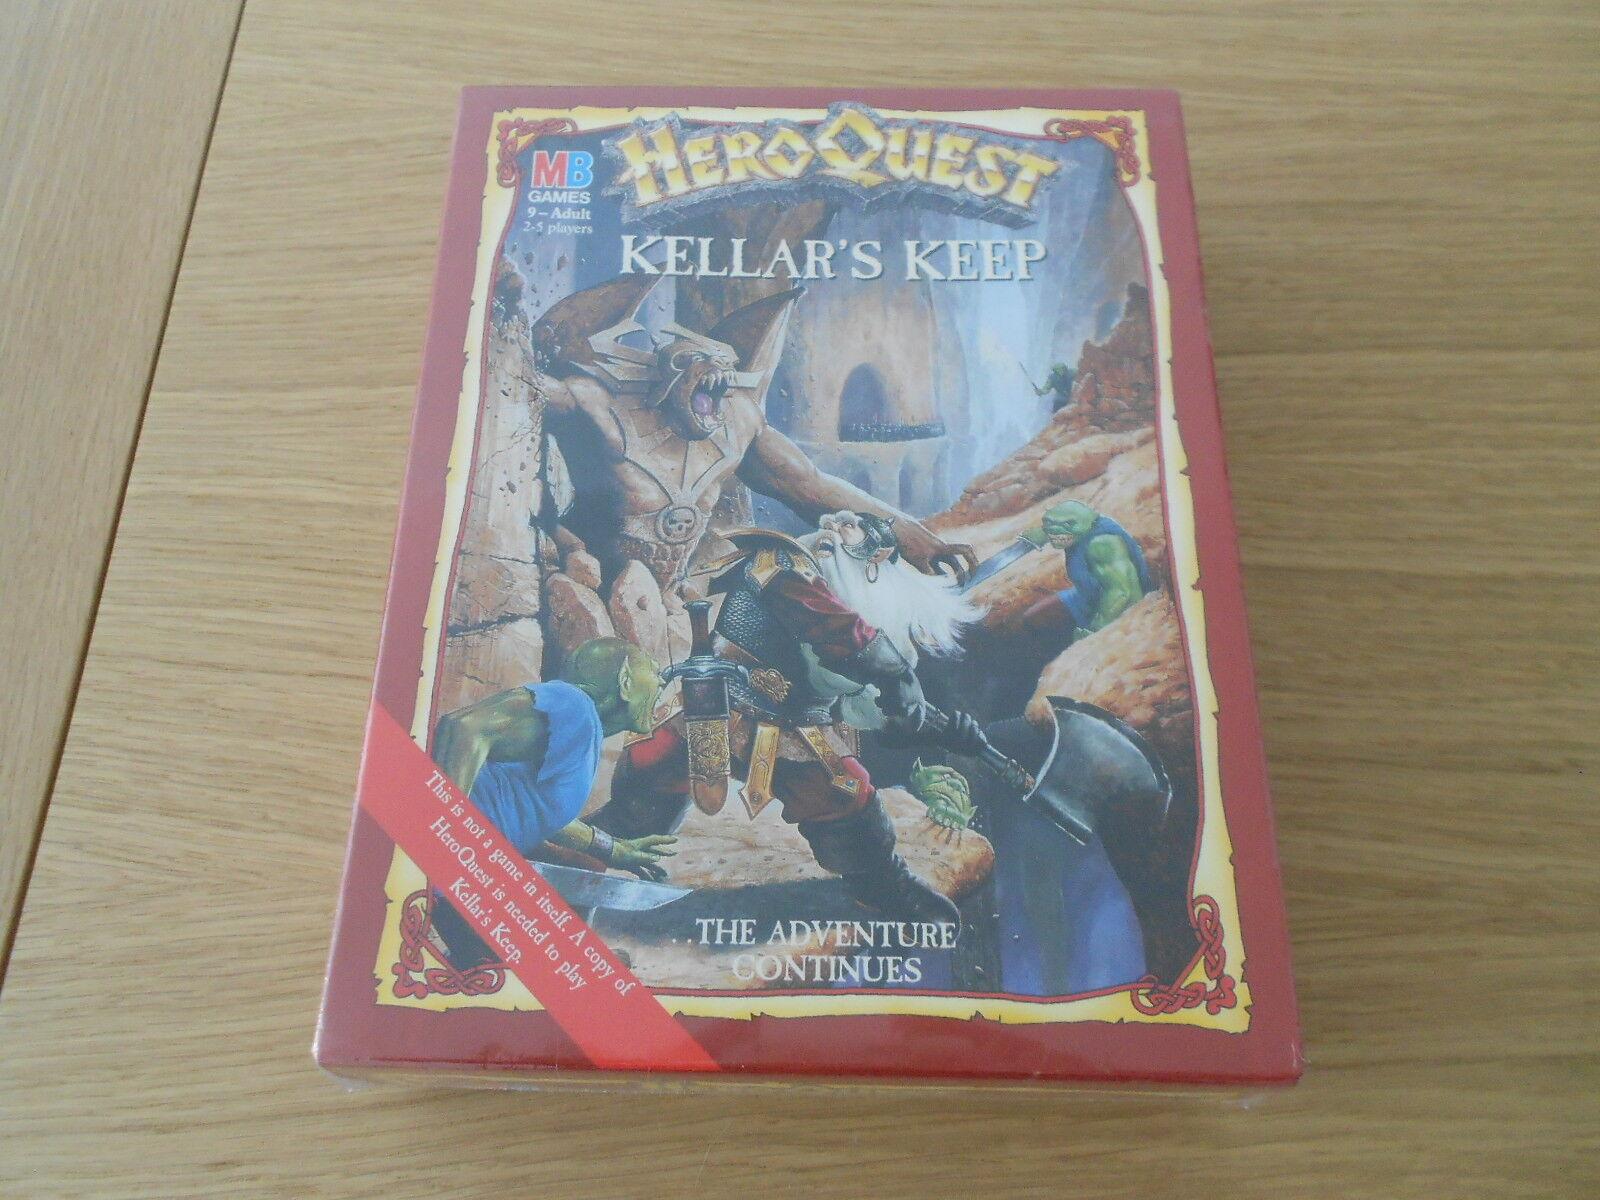 Jeu HEROFRU - Kellar livhander65533;65533; s Keep - La tour de Kellar - MB Jeux arbetarhop - SW